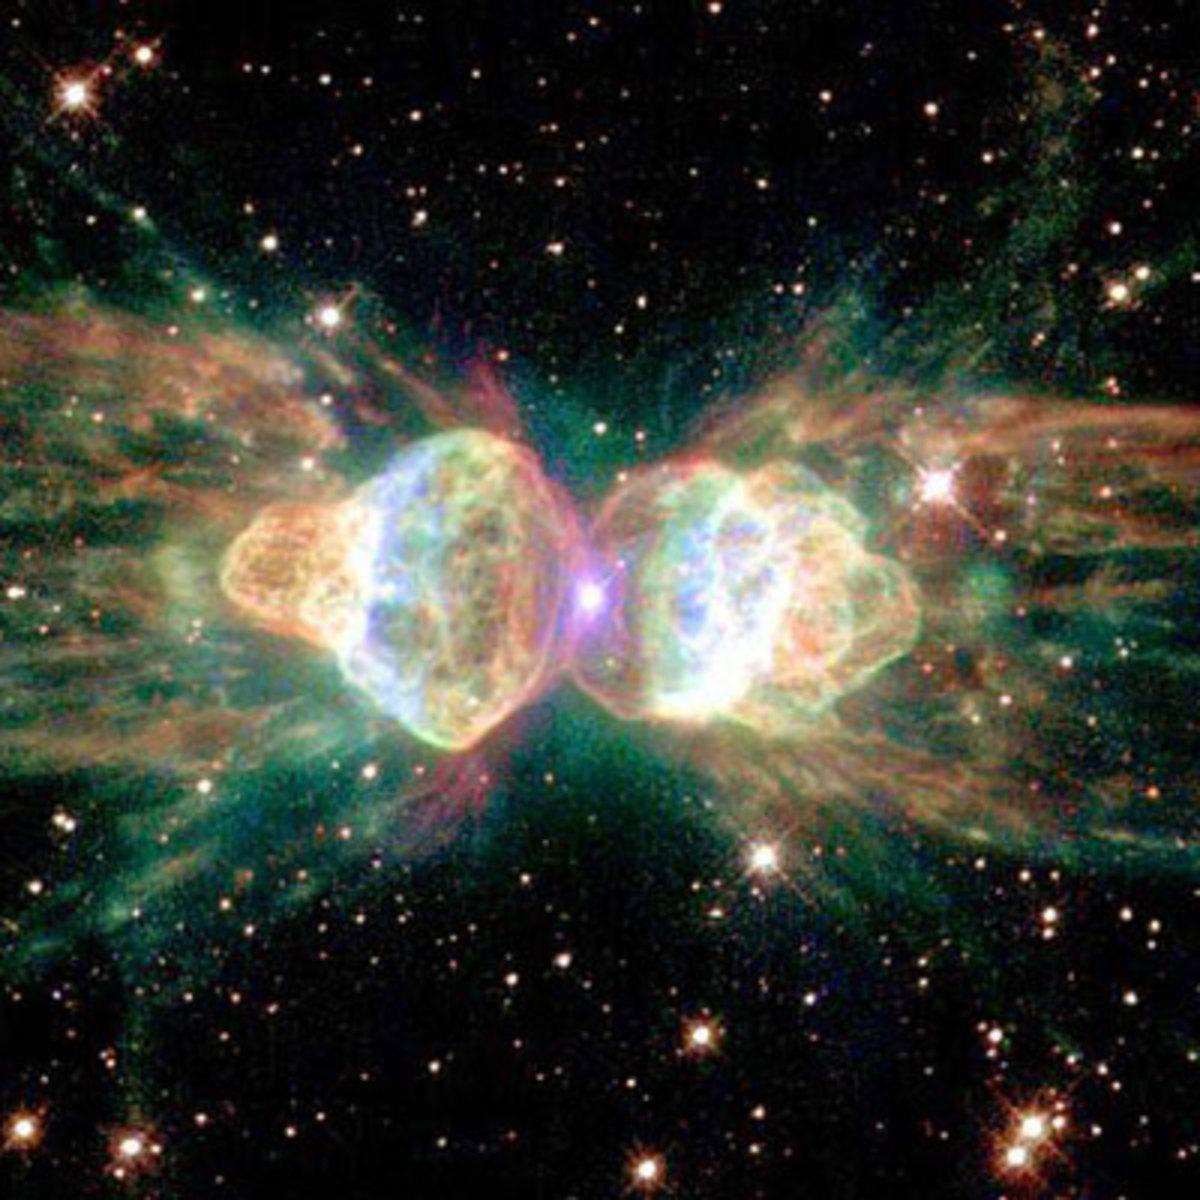 peter-sun-starships-are-made-of-love.jpg